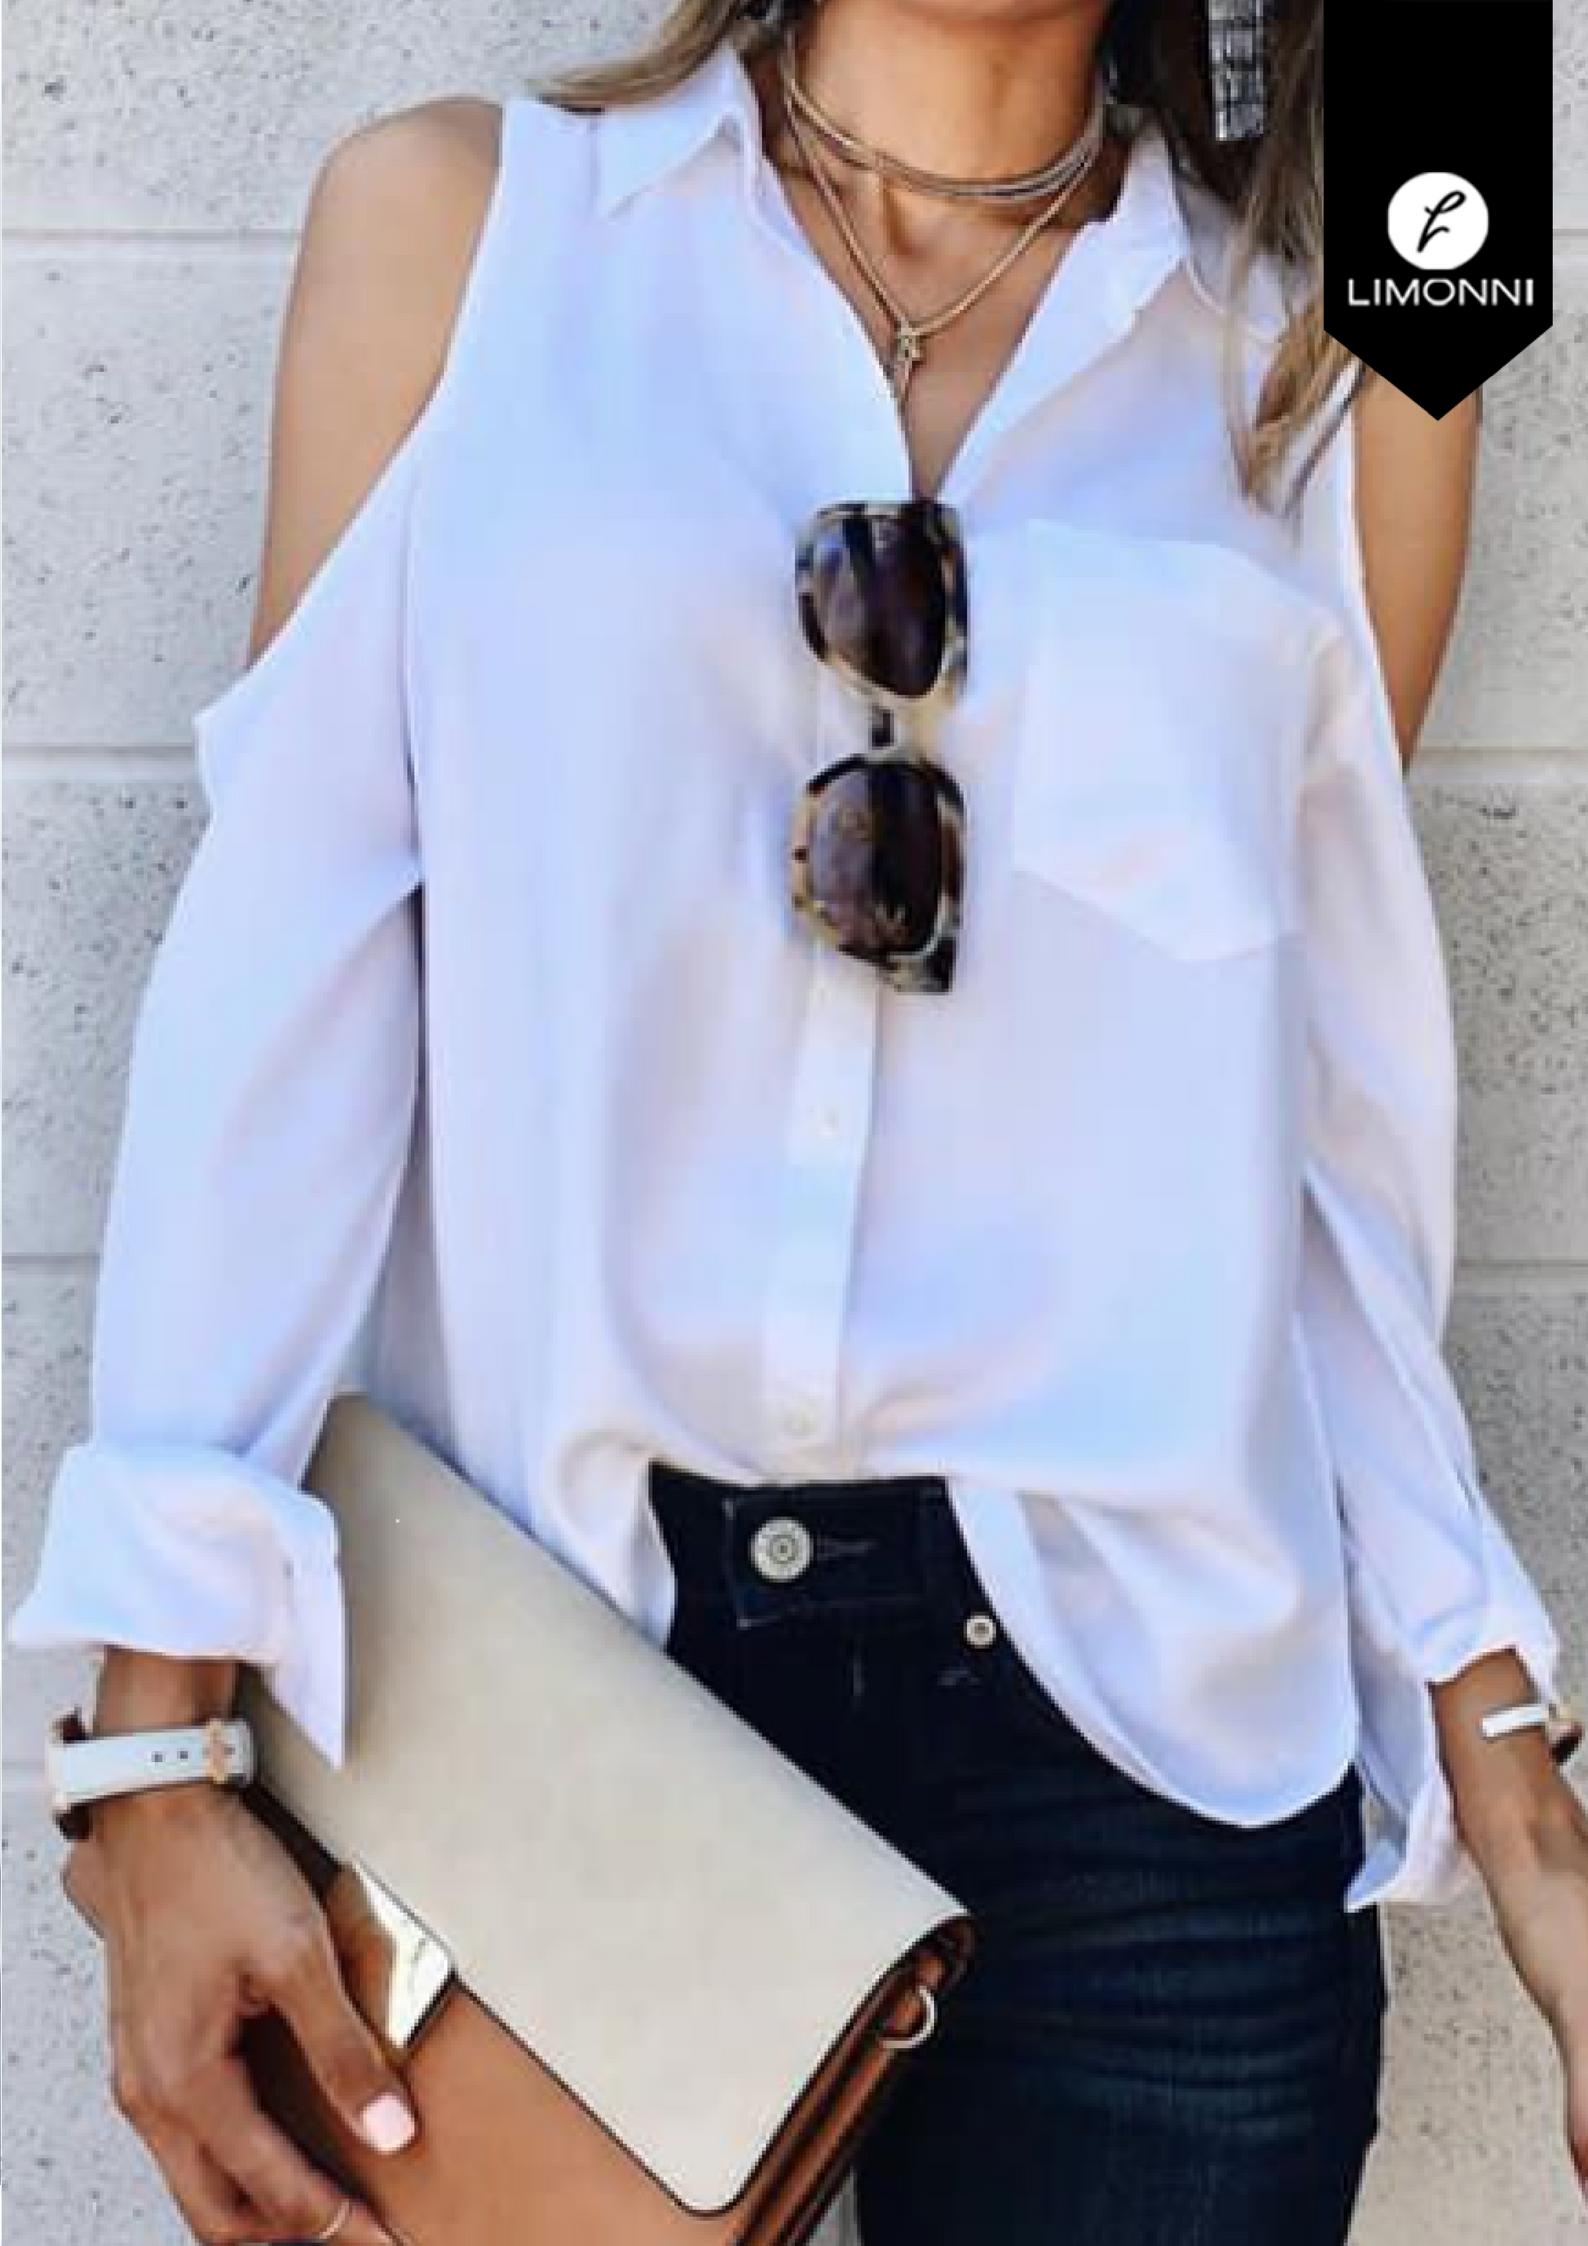 Blusas para mujer Limonni Bennett LI1374 Campesinas